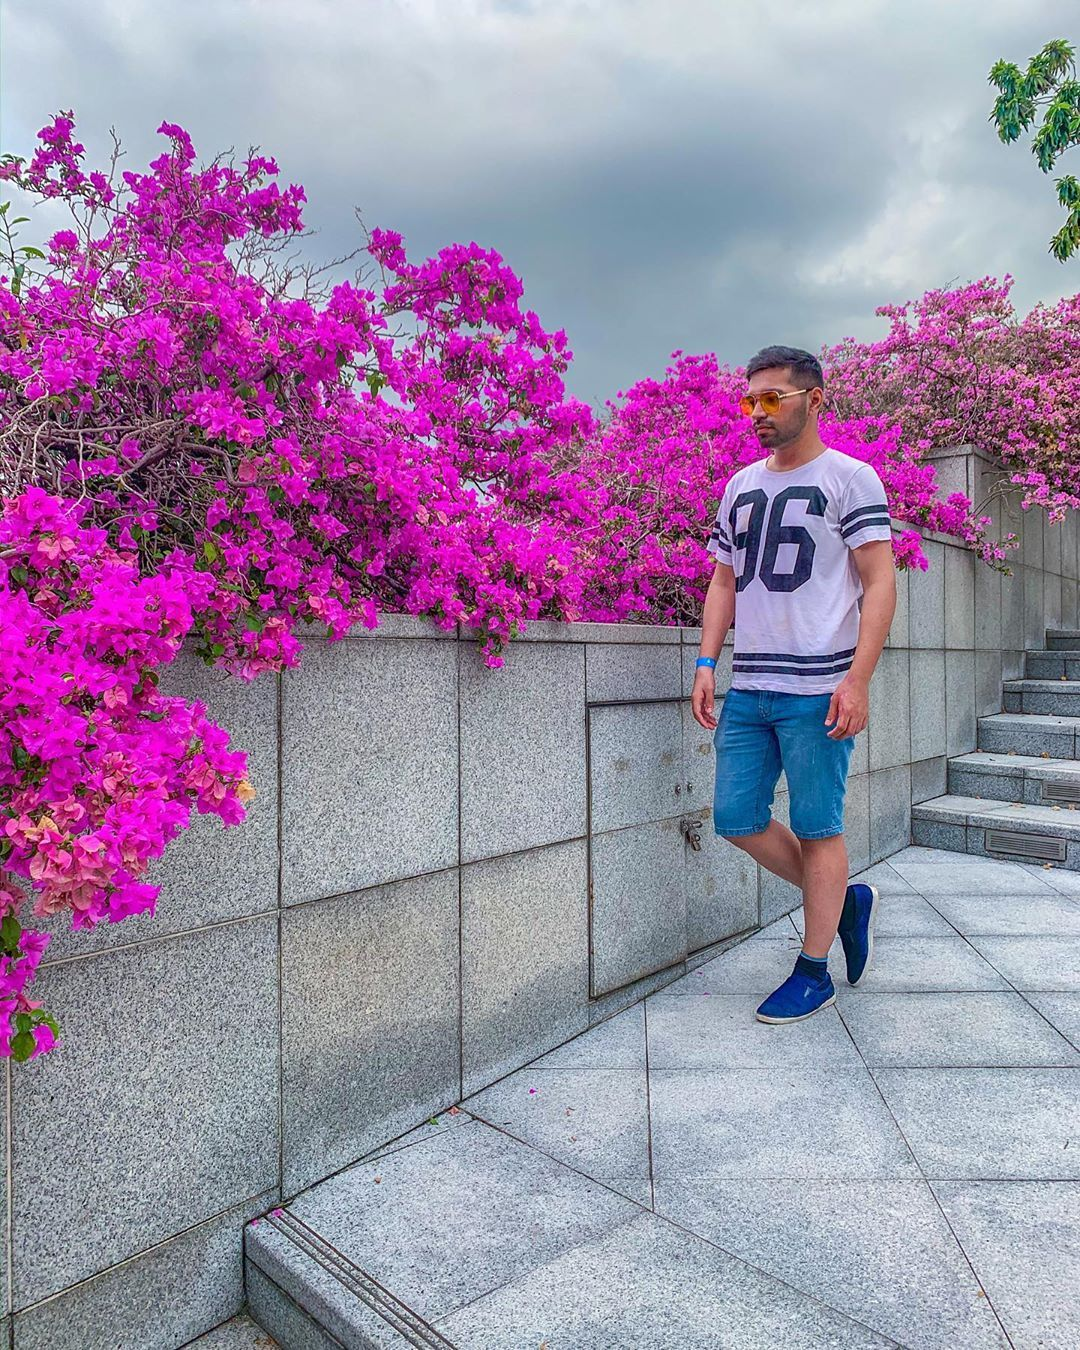 𝕎𝕖 𝕜𝕟𝕠𝕨 𝕨𝕙𝕒𝕥 𝕨𝕖 𝕒𝕣𝕖 𝕓𝕦𝕥 𝕜𝕟𝕠𝕨 𝕟𝕠𝕥 𝕨𝕙𝕒𝕥 𝕨𝕖 𝕞𝕒𝕪 𝕓𝕖  MERLION PARK SINGAPORE